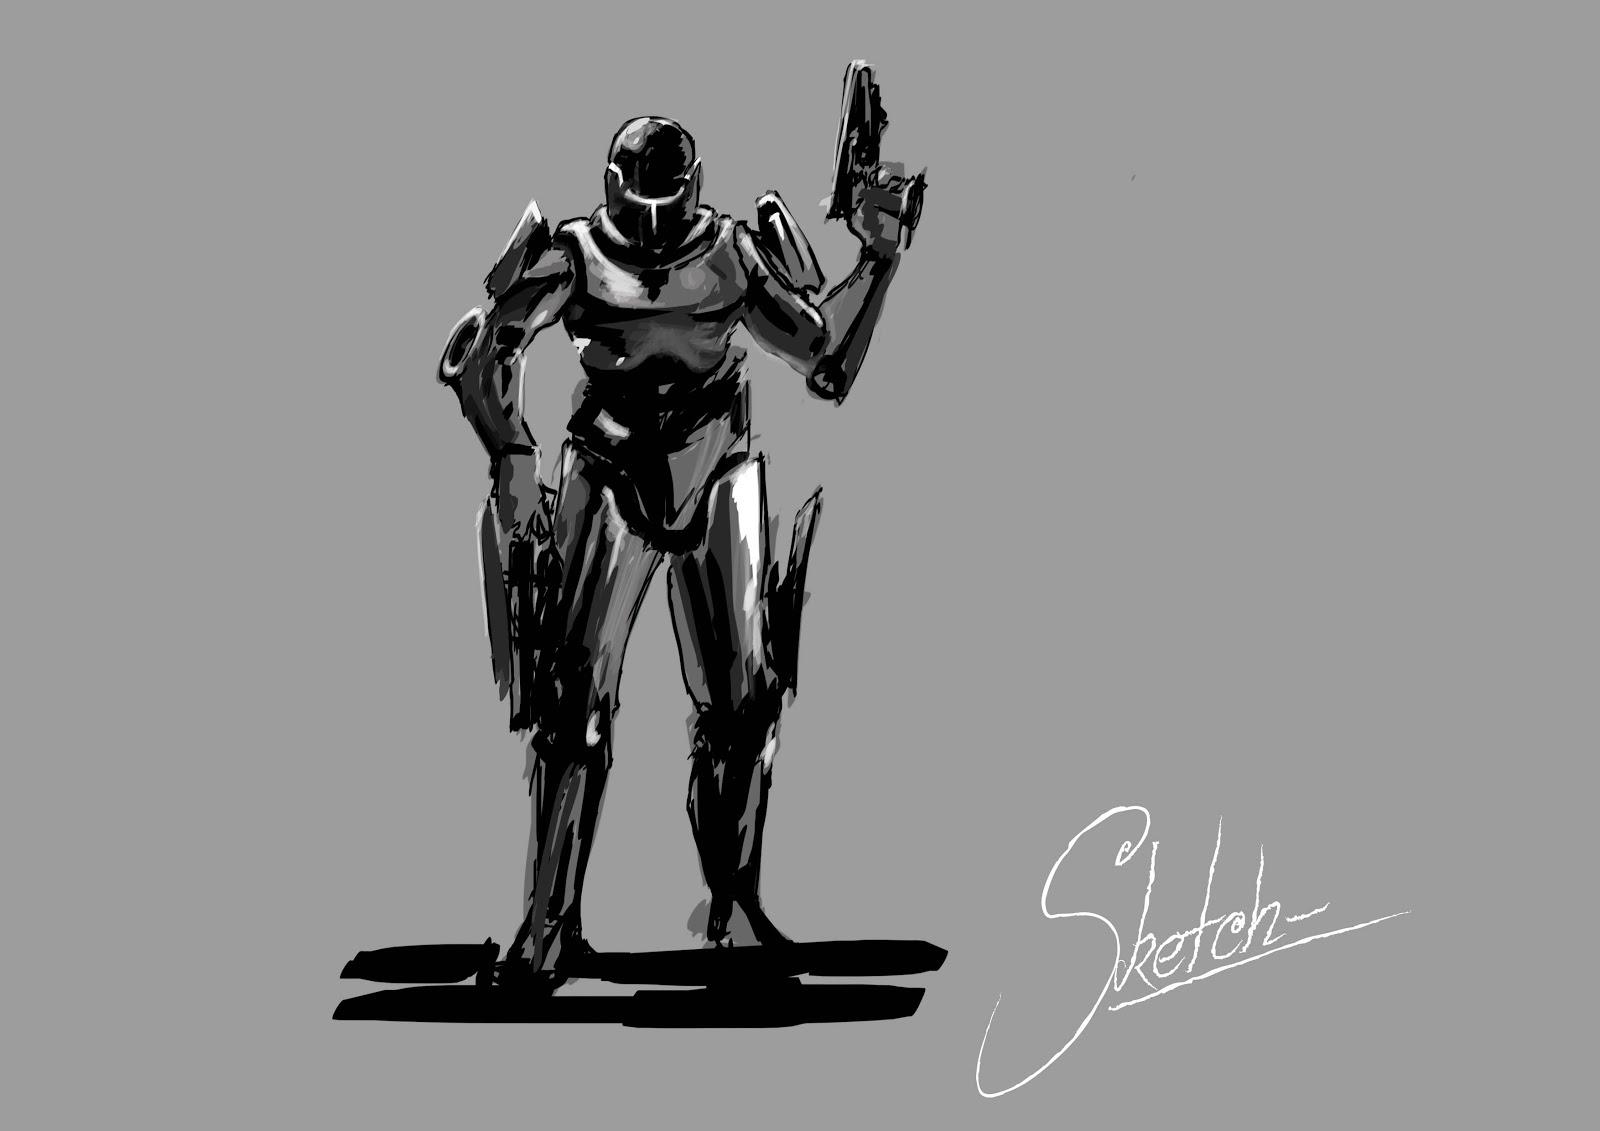 SkeTcH-'s Drawingboard: Robocop